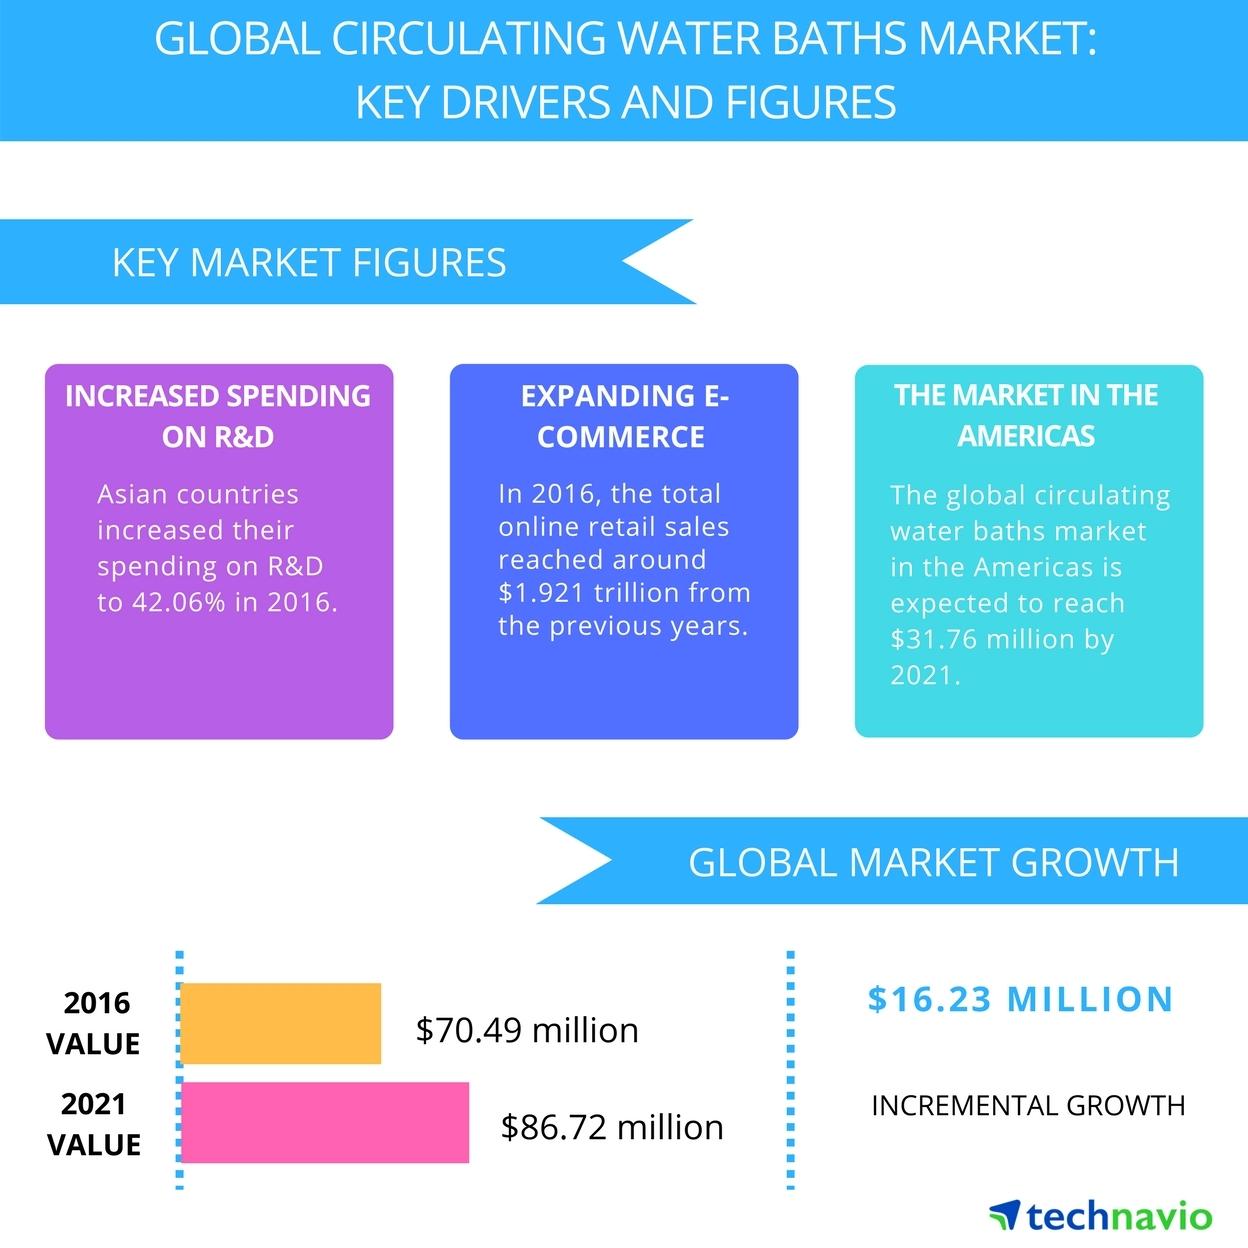 Top 3 Trends Impacting the Global Circulating Water Baths Market ...